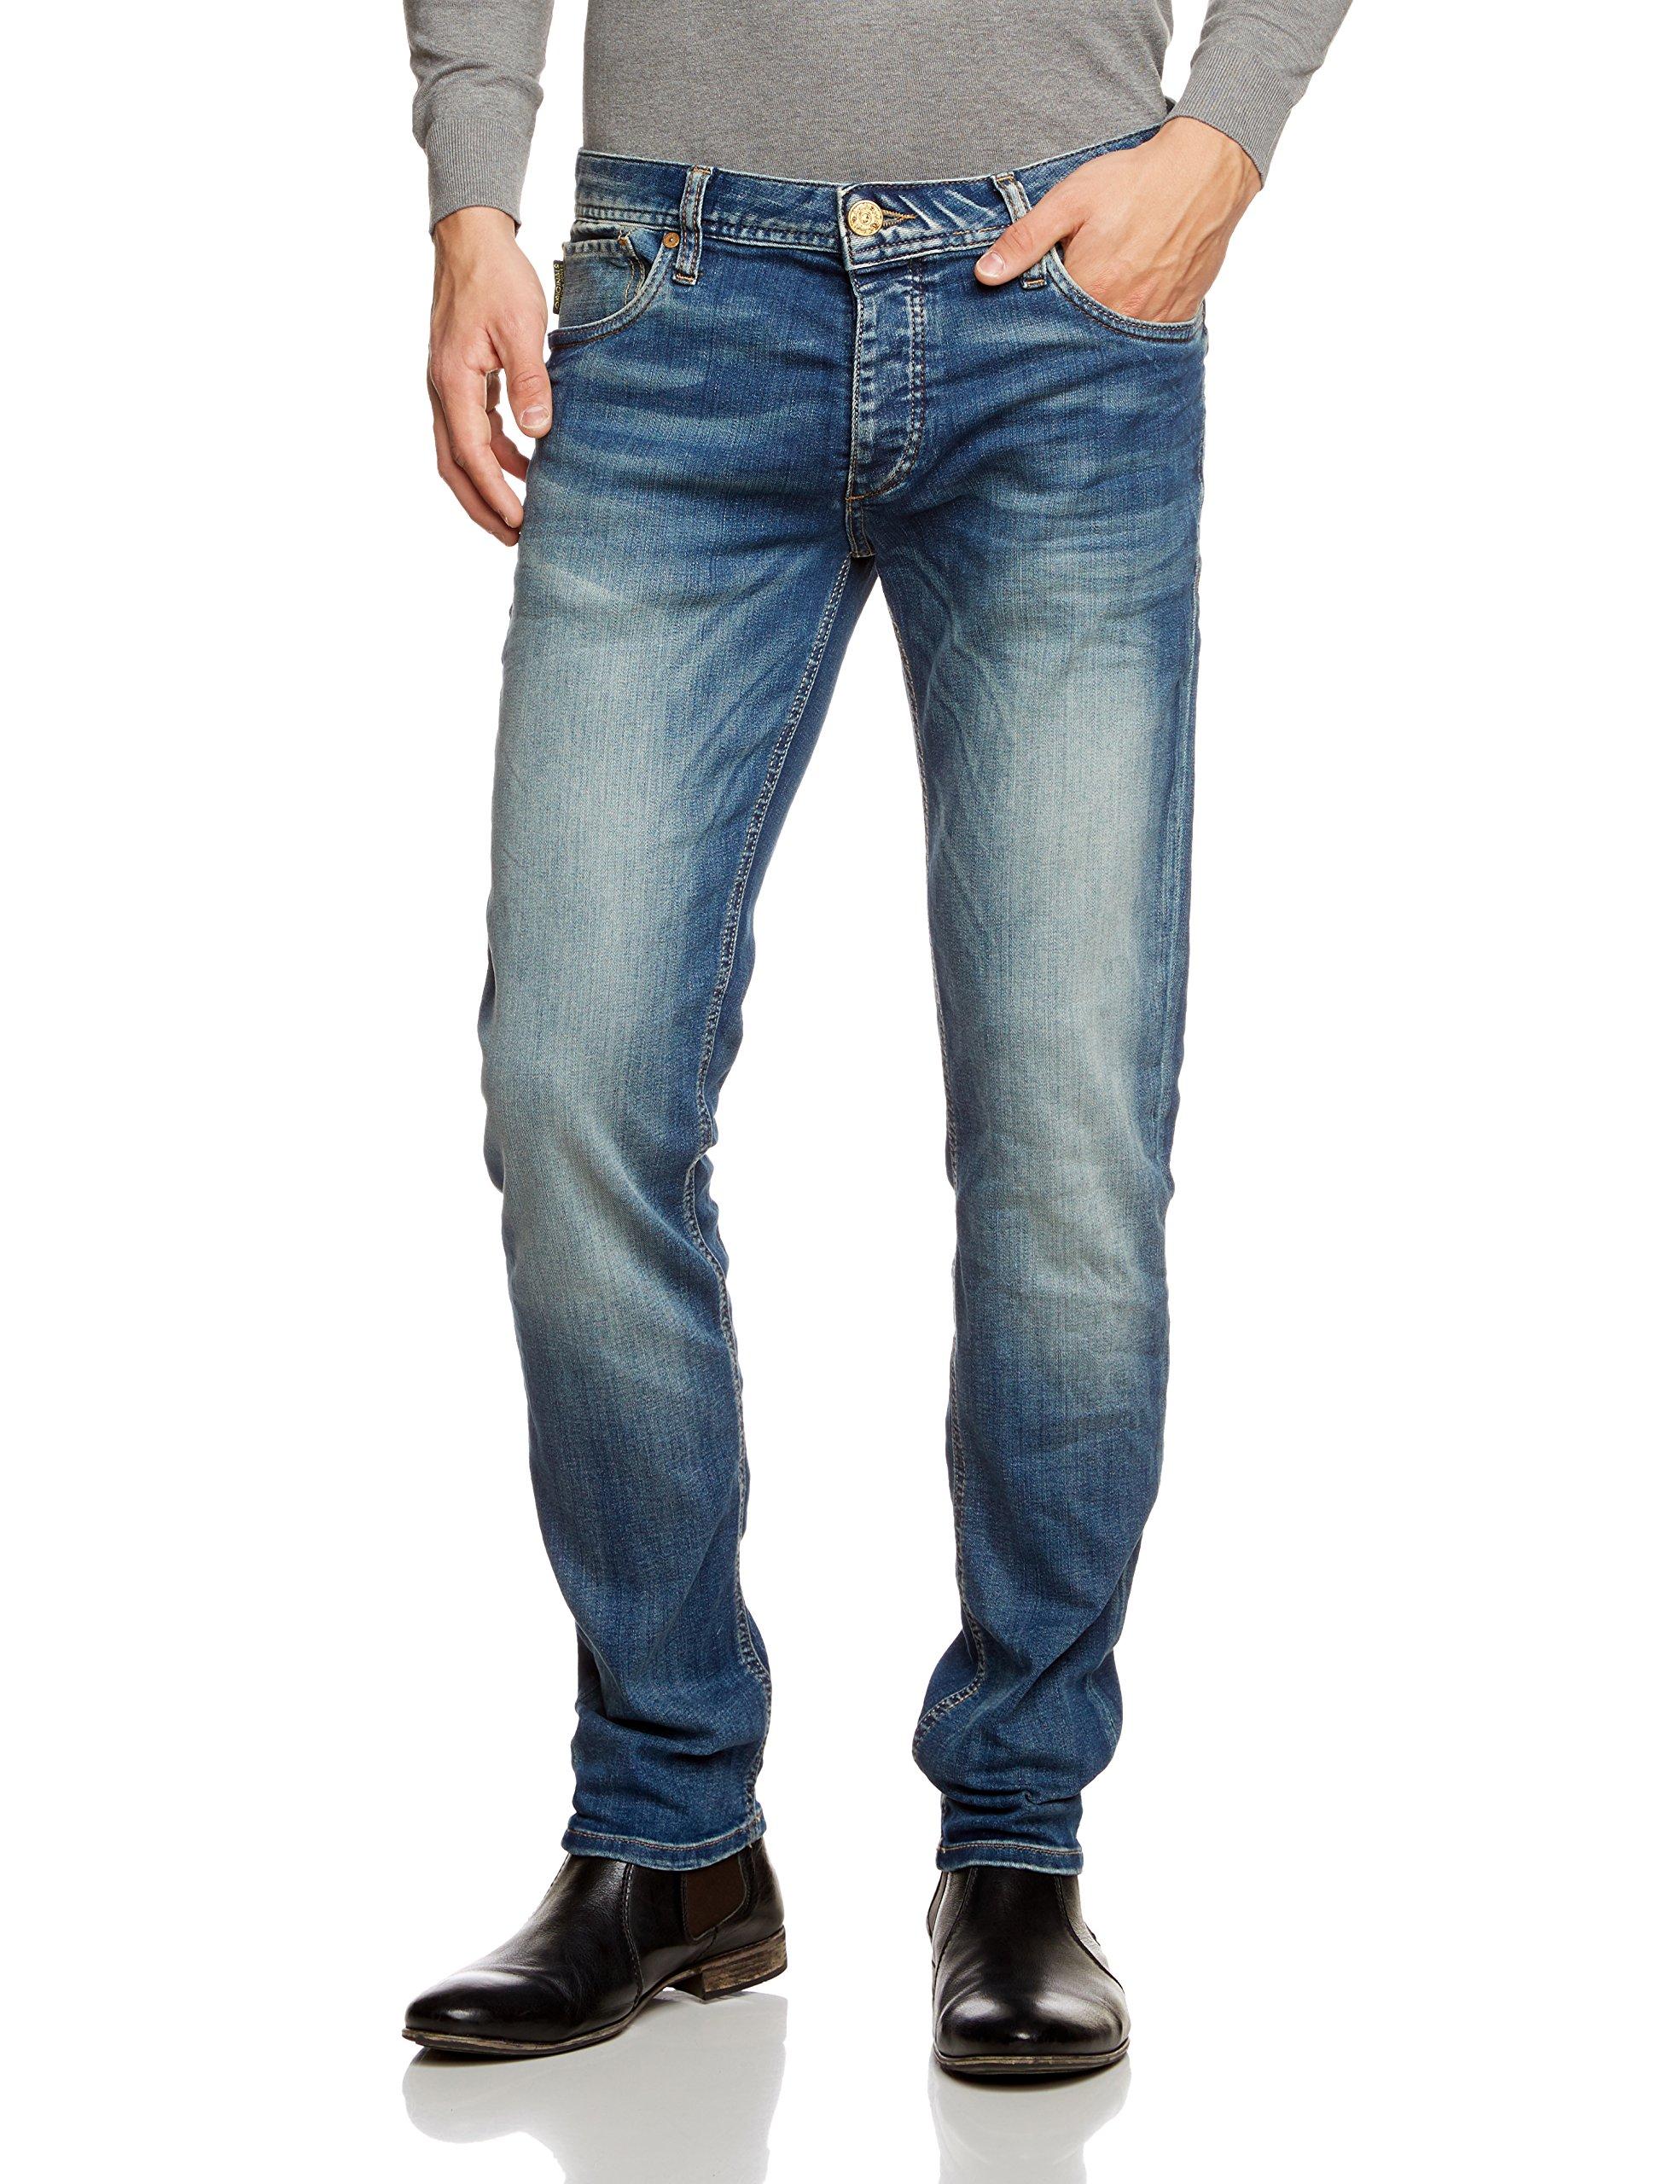 Slim HommeBleuW29L34taille Original Jos Jackamp; 094Jeans FabricantW29L34 Jones Jjtim wnkX8O0P